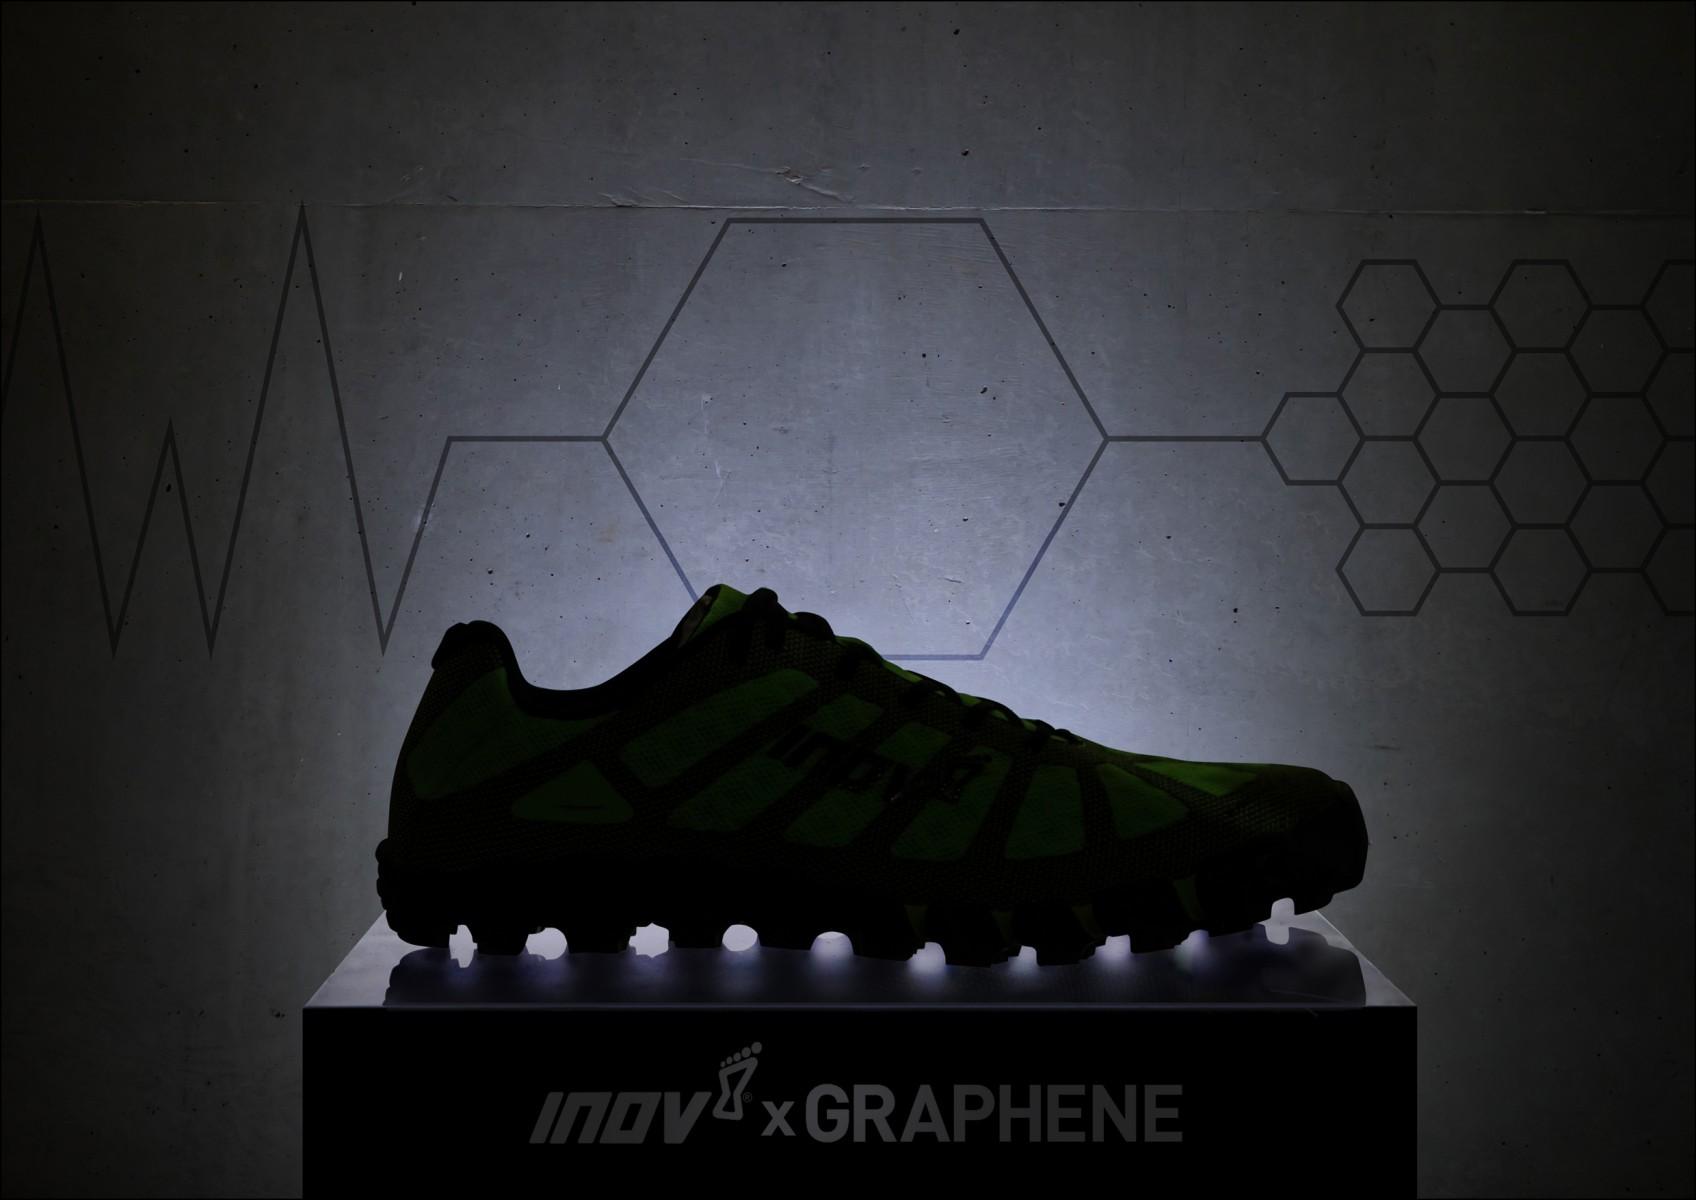 ffd1a6b8 Graphene running shoes will hit the market next year | TechCrunch